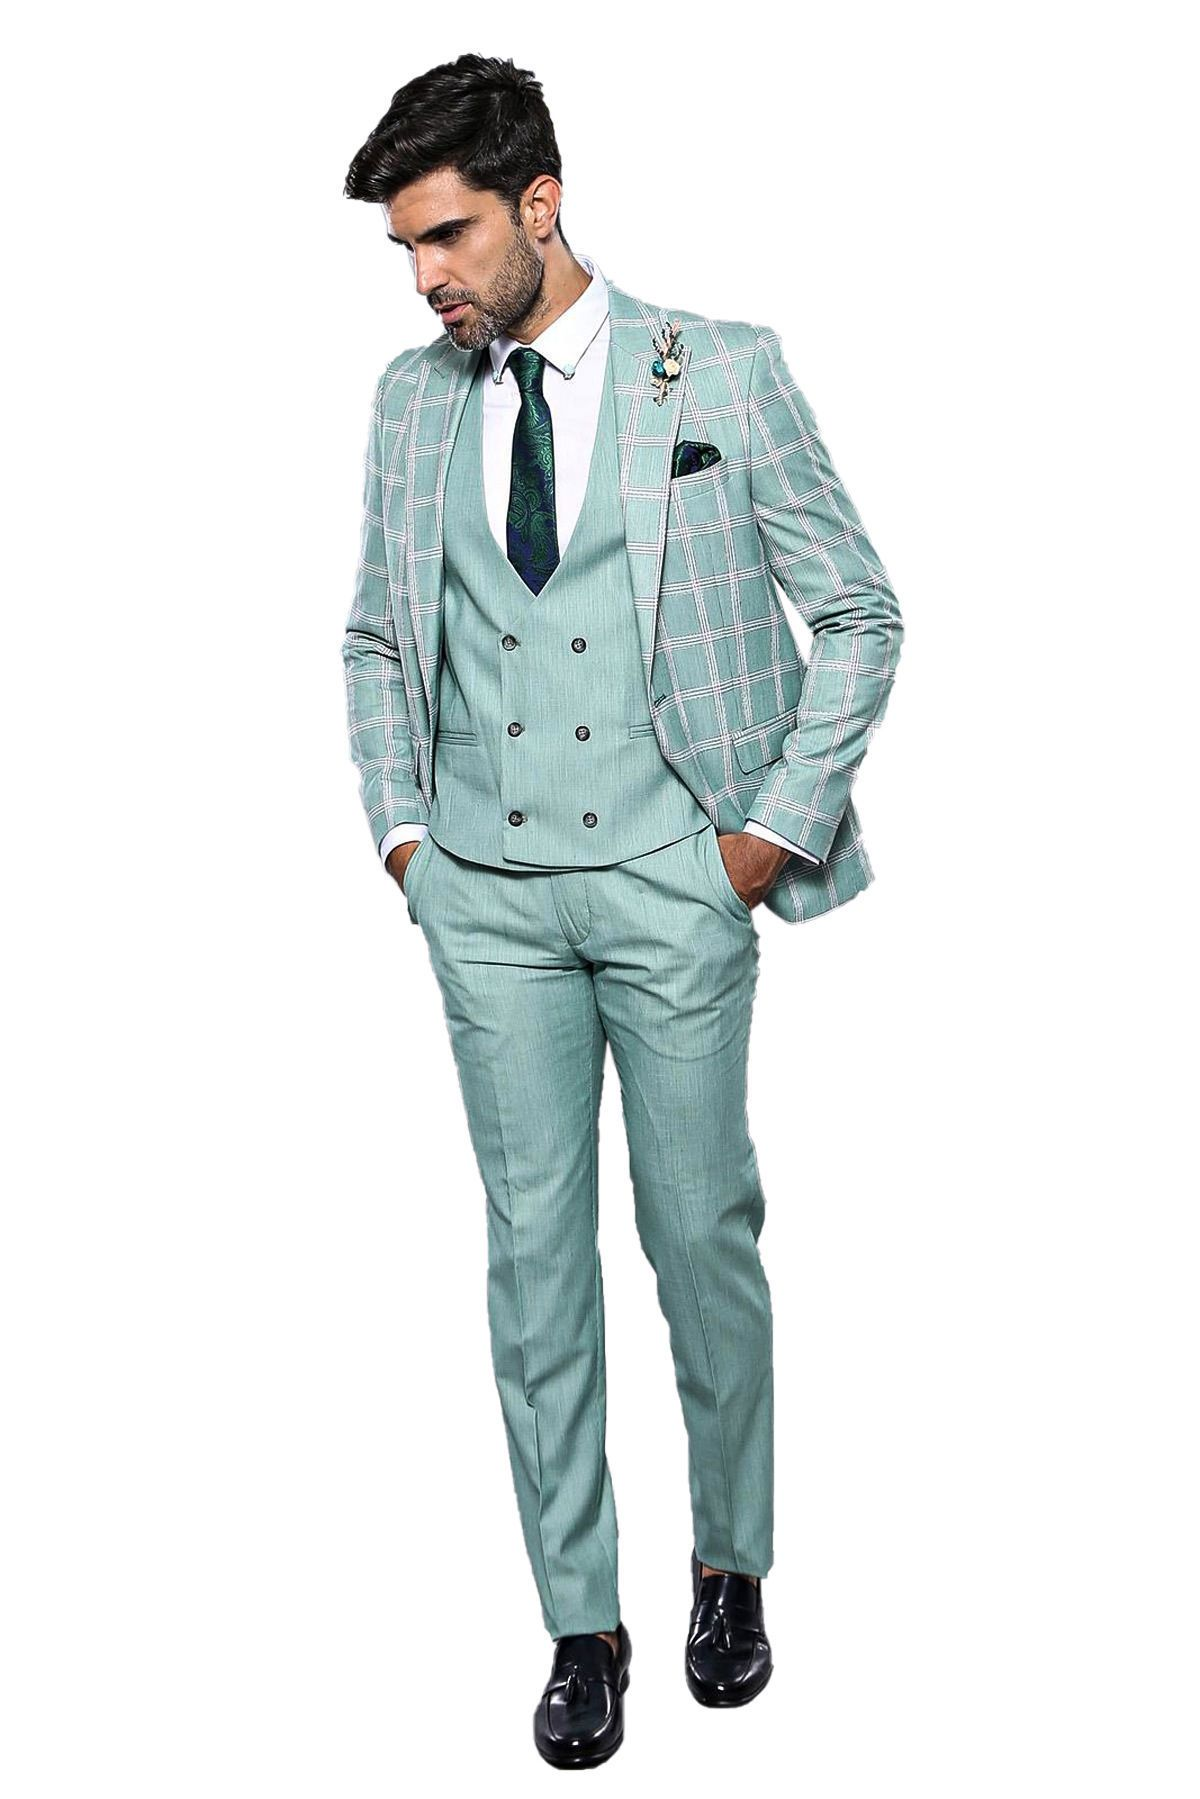 طقم بدلة أخضر فاتح بمربعات رجالي Fashion Suits Jackets